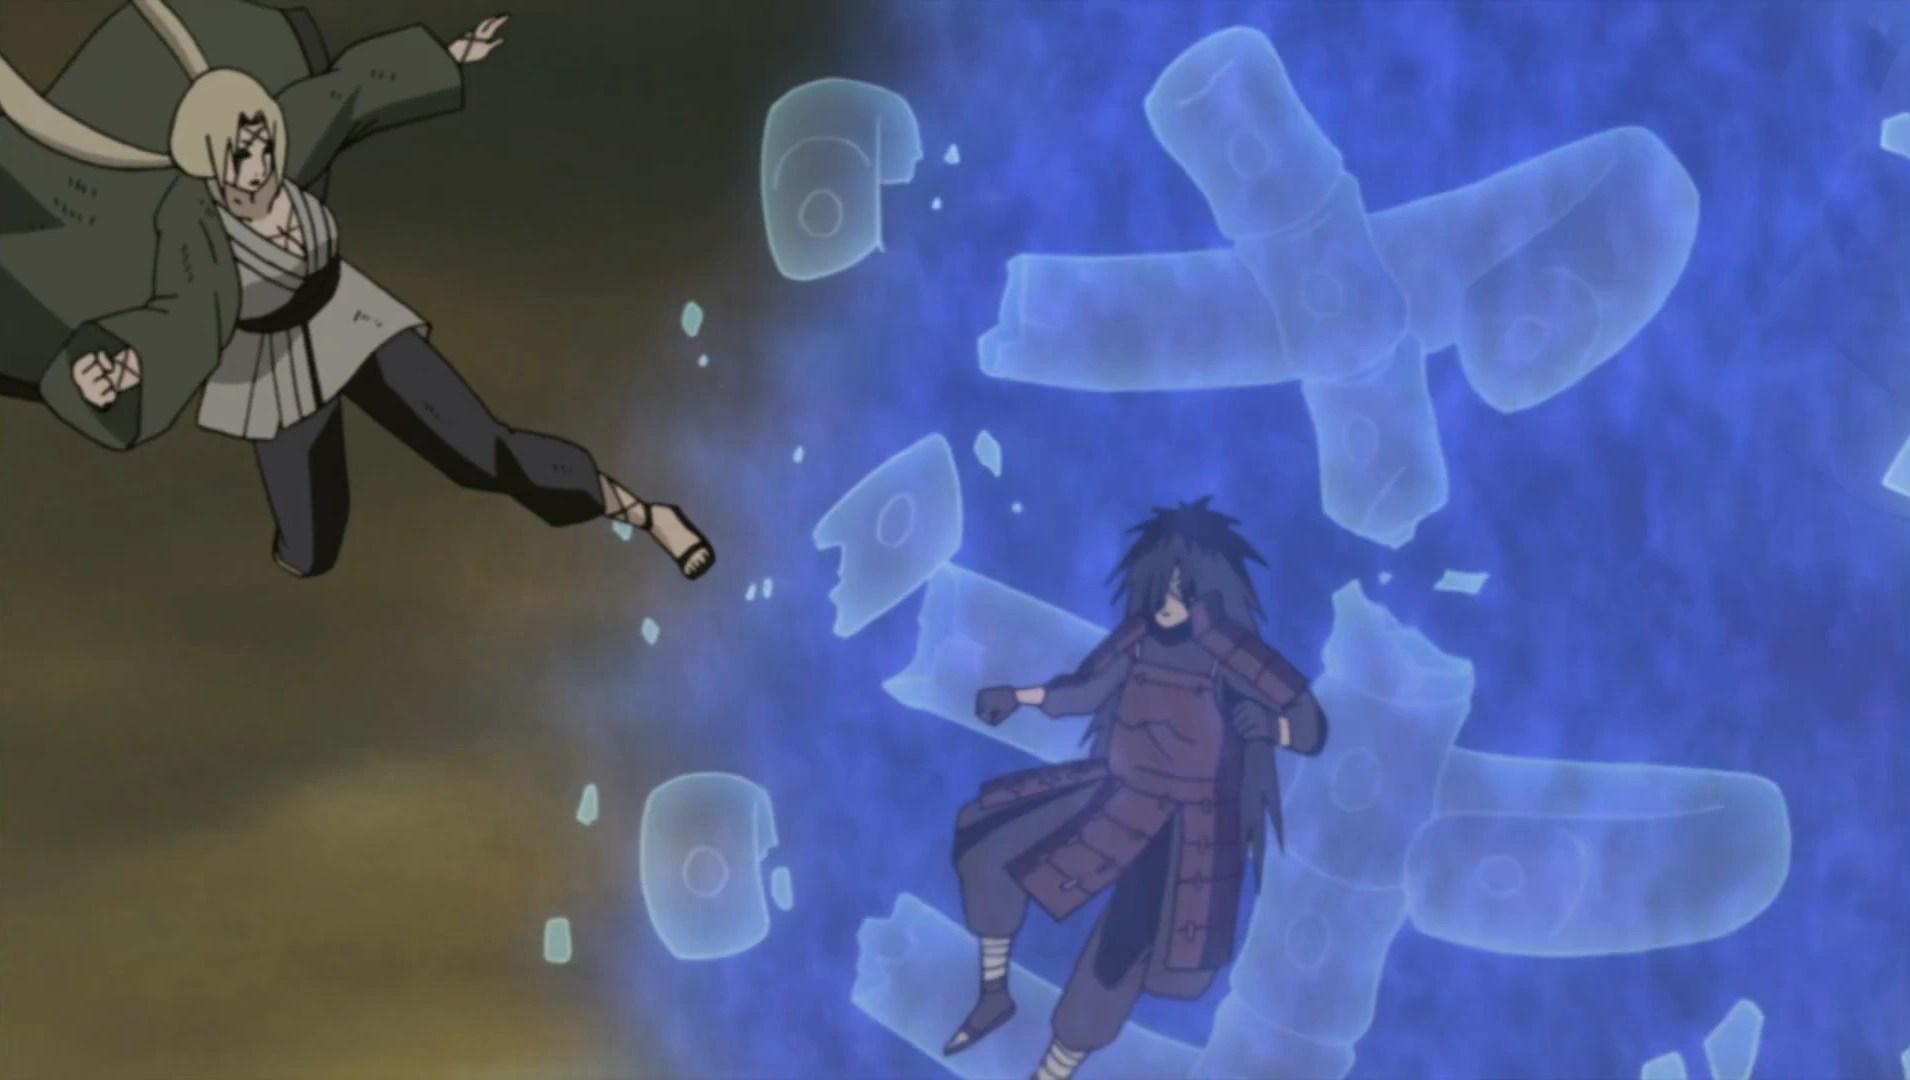 Heaven Spear Kick Narutopedia Fandom powered by Wikia